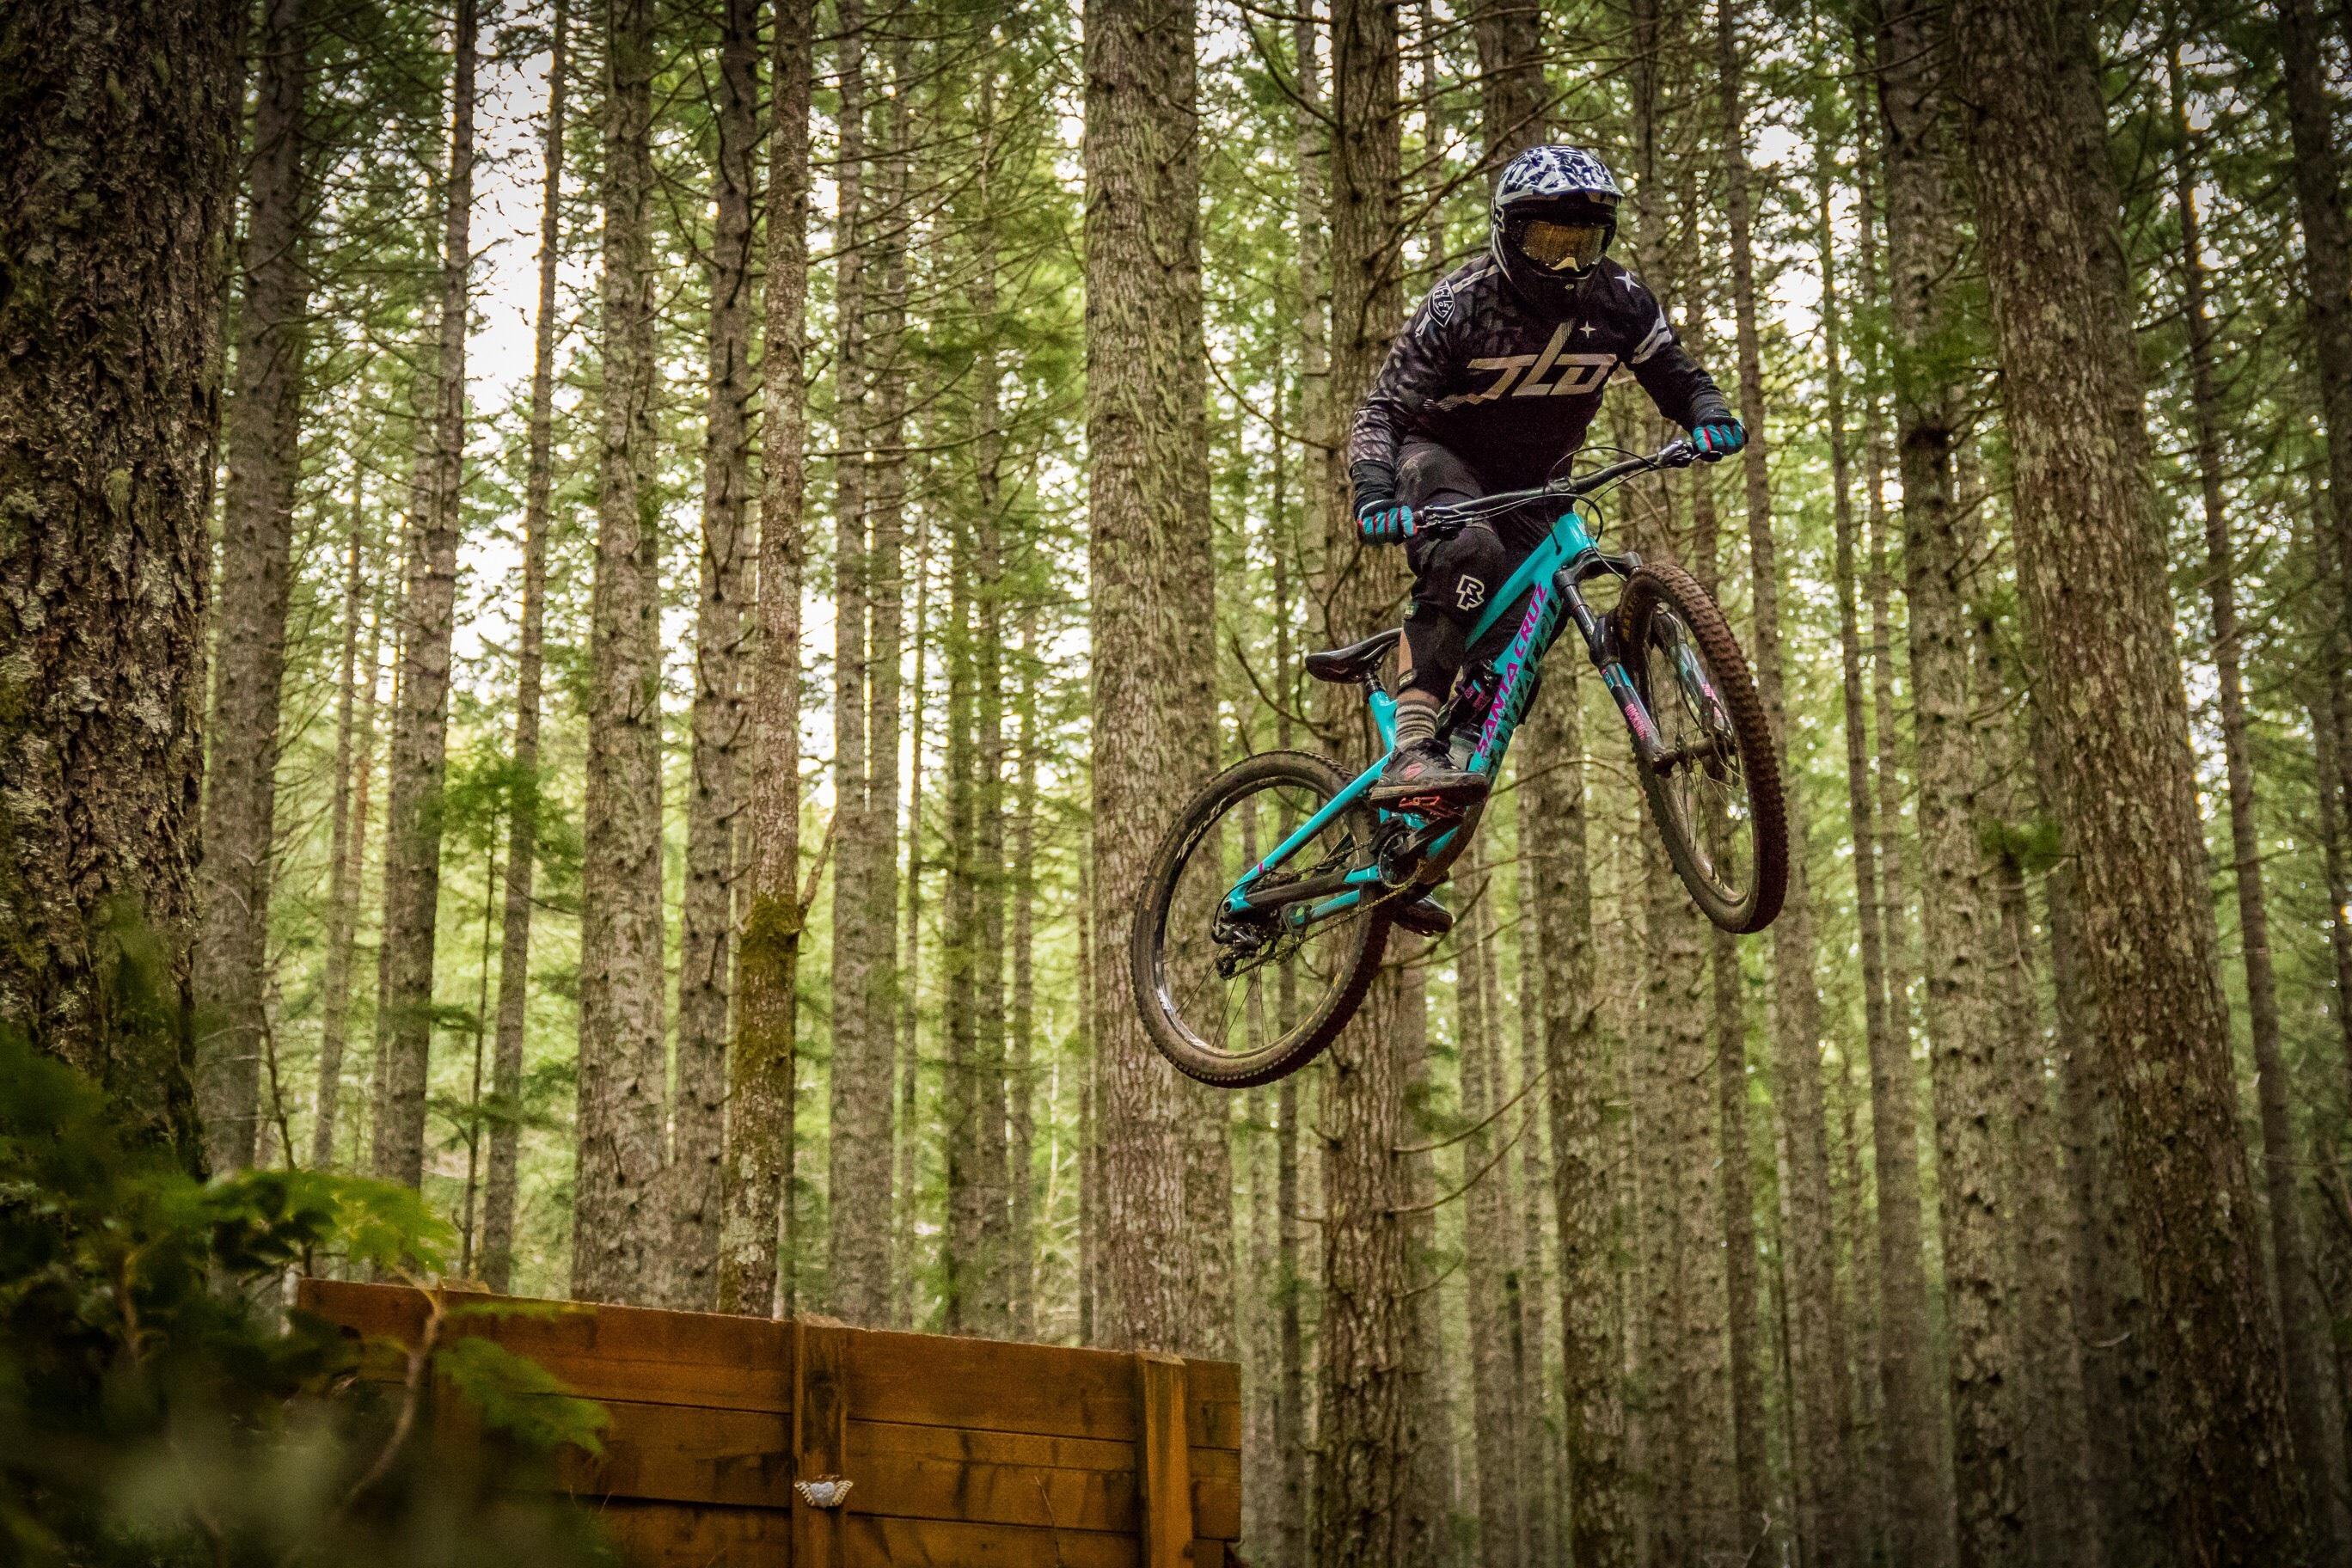 картинки велосипедиста в лесу